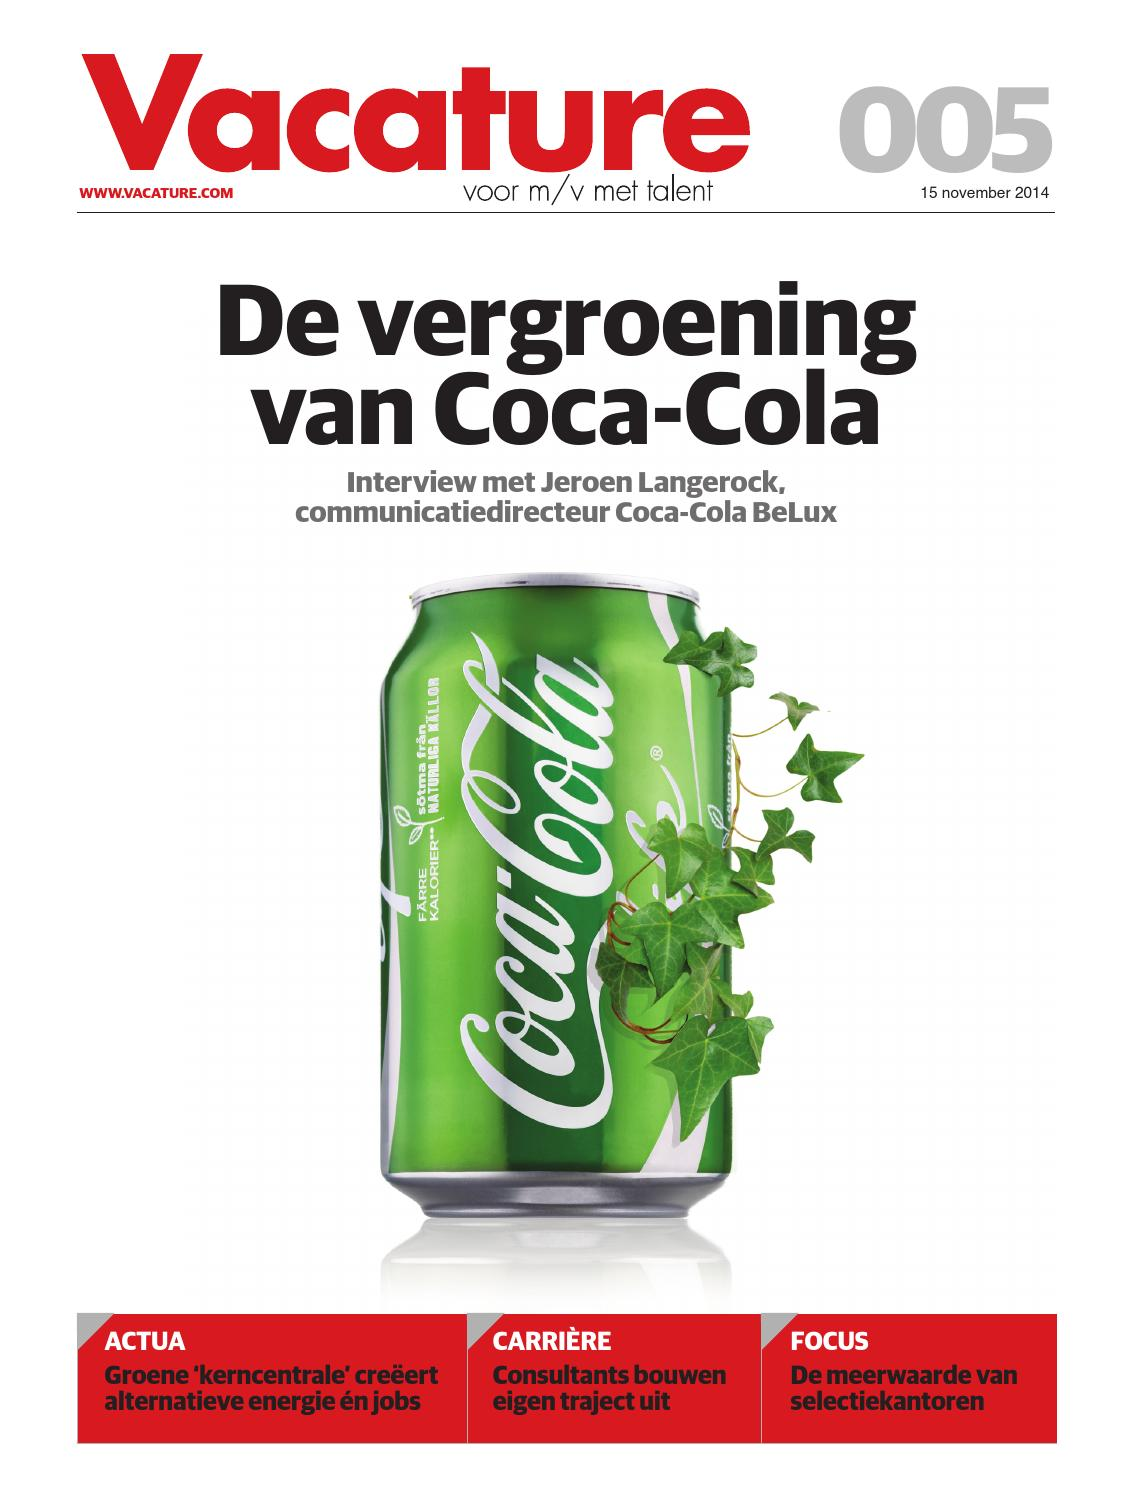 vacature magazine 15 11 2014 by jobs  u0026 careers cv